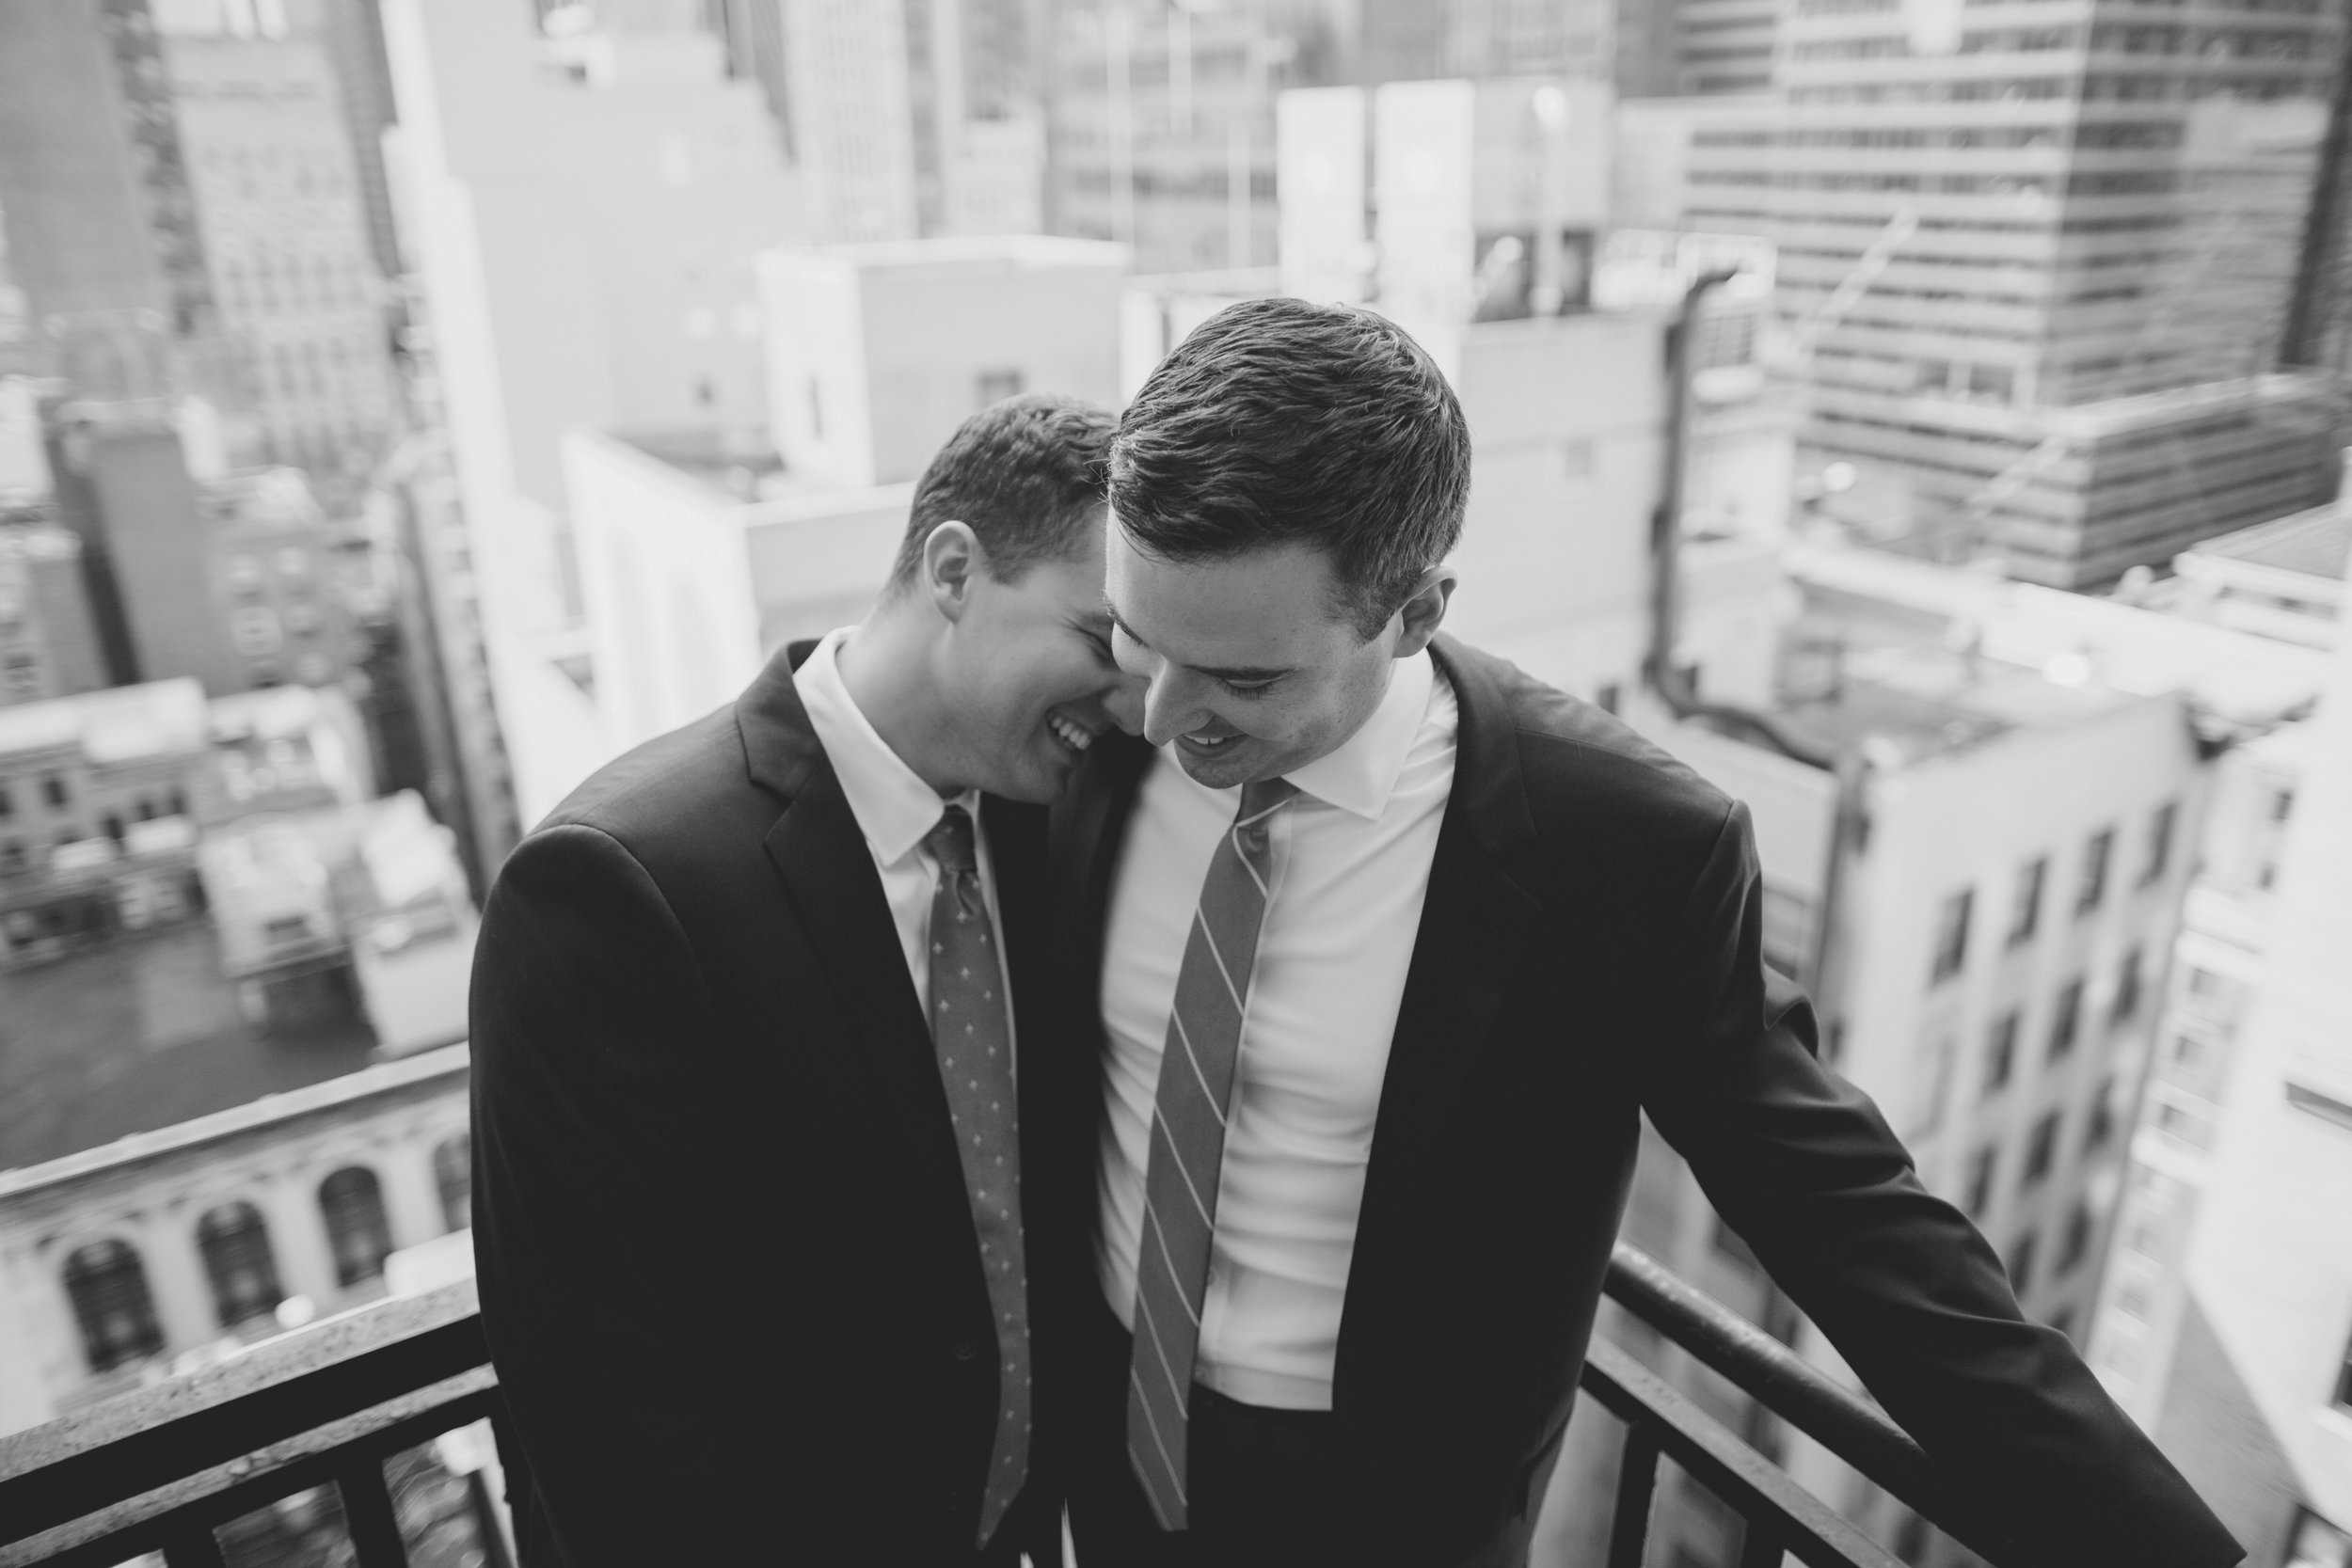 amanda_vanvels_new_york_lgbtq_gay_wedding_029.jpg